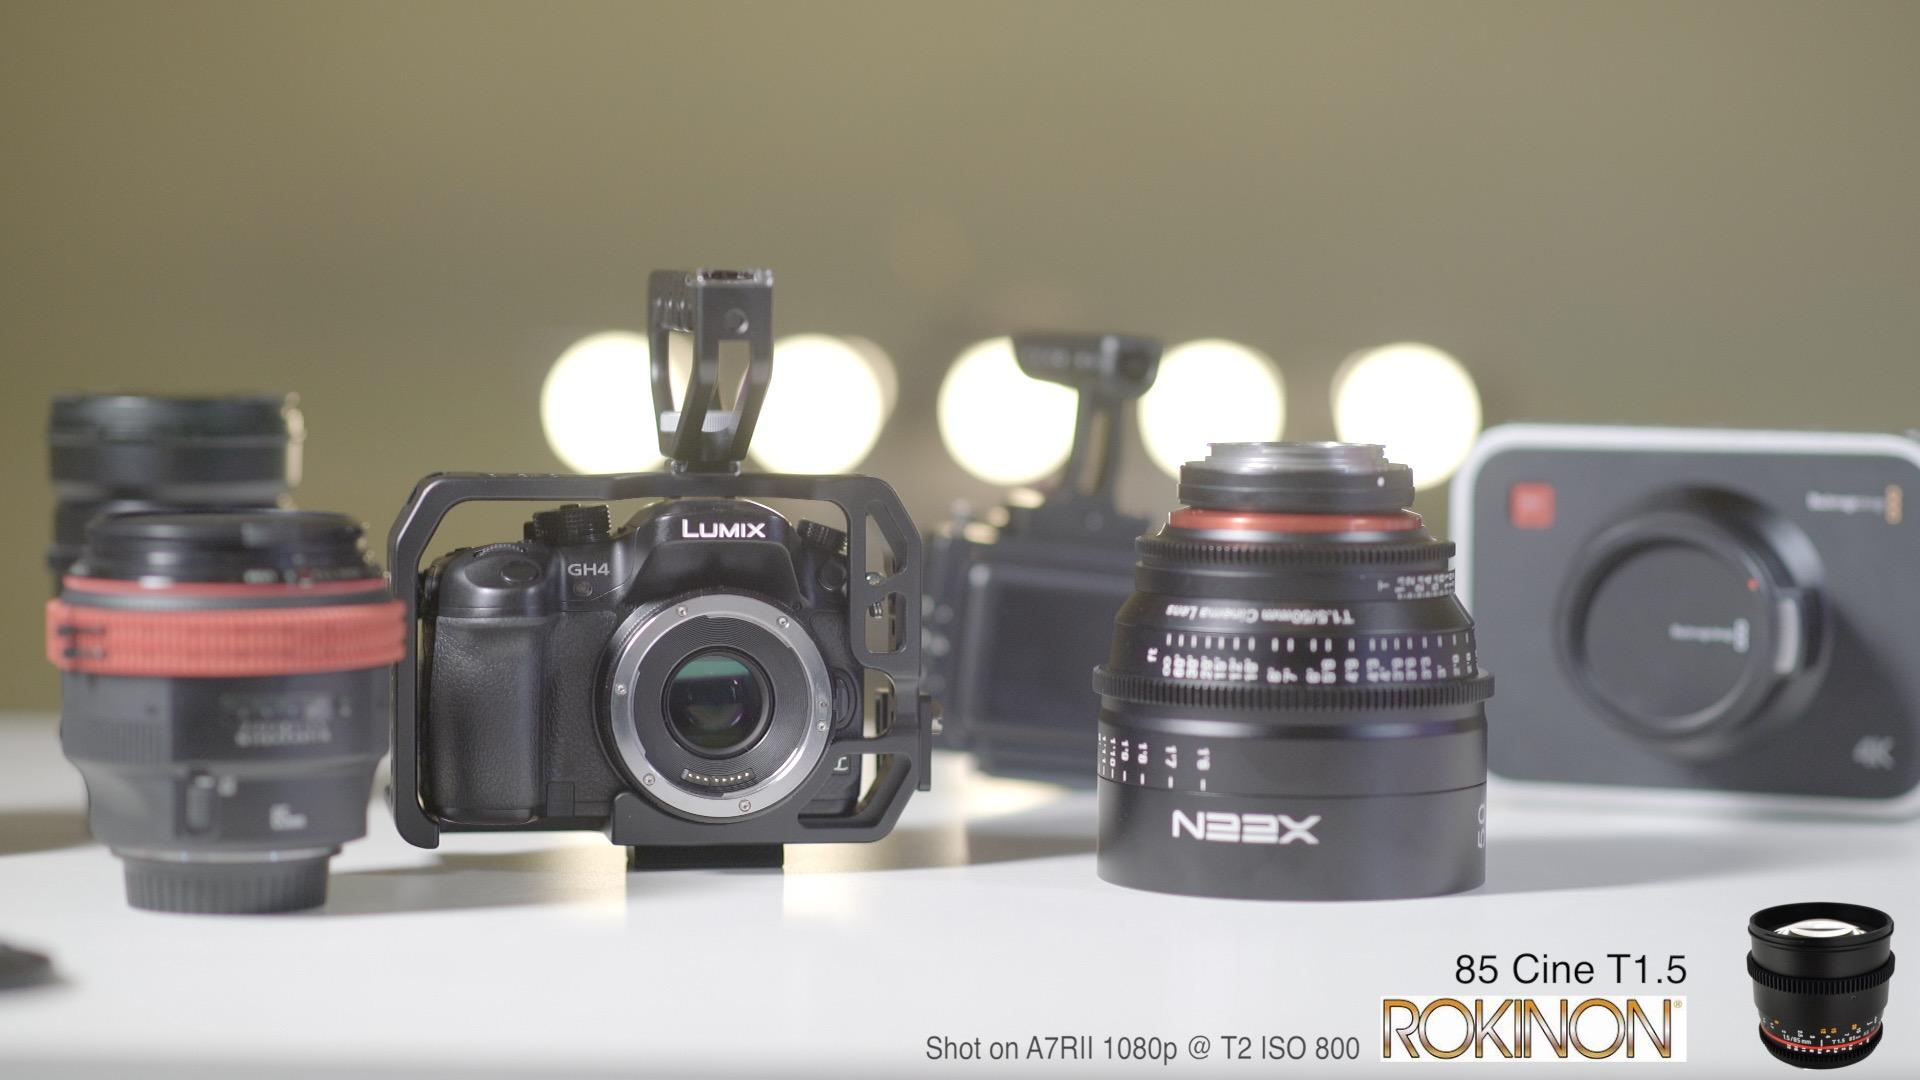 85 Cine Lens